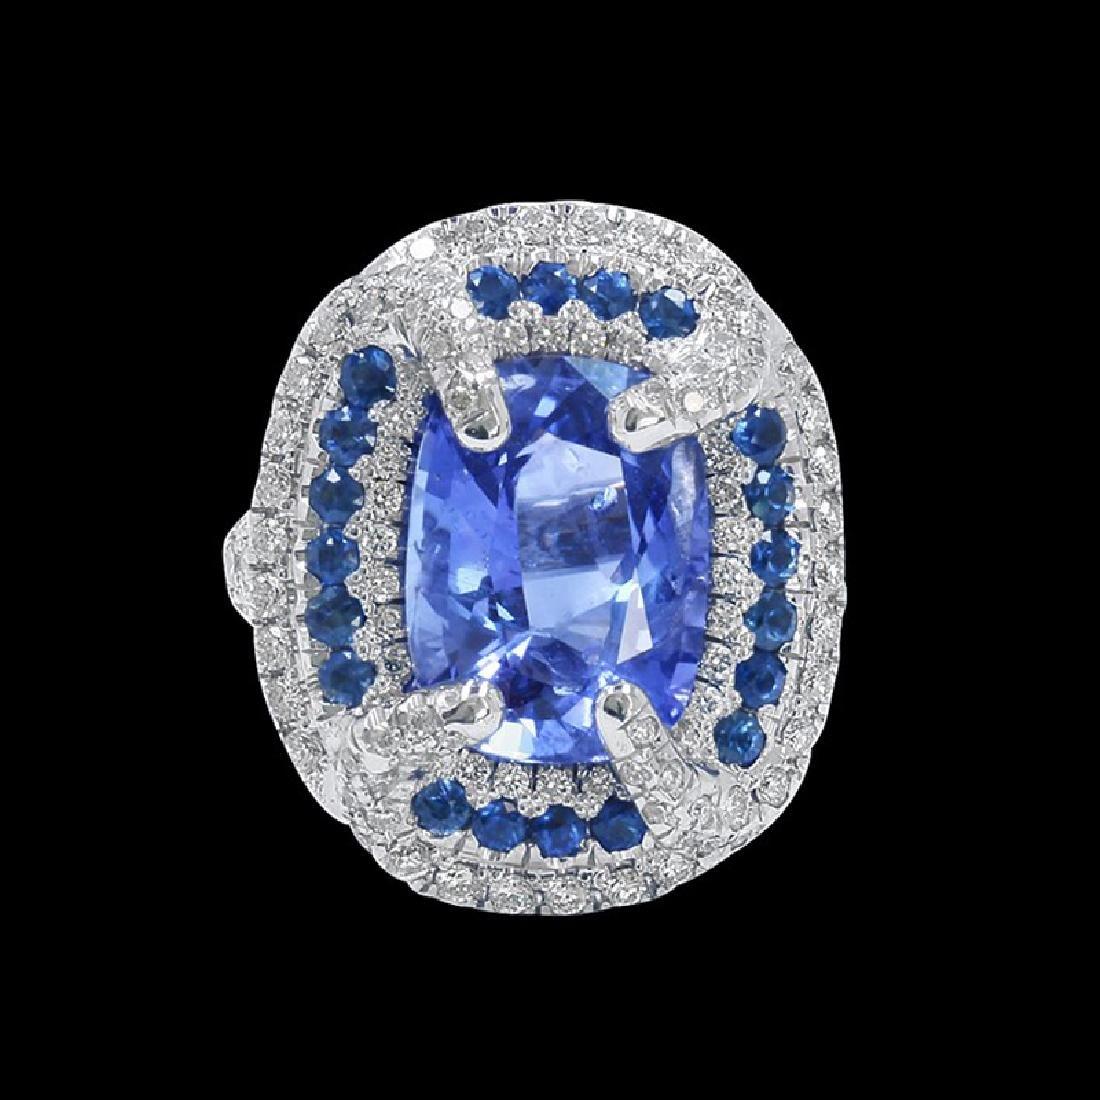 GIA 8.77CT NATURAL BLUE CEYLON SAPPHIRE (COLOR CHANGE